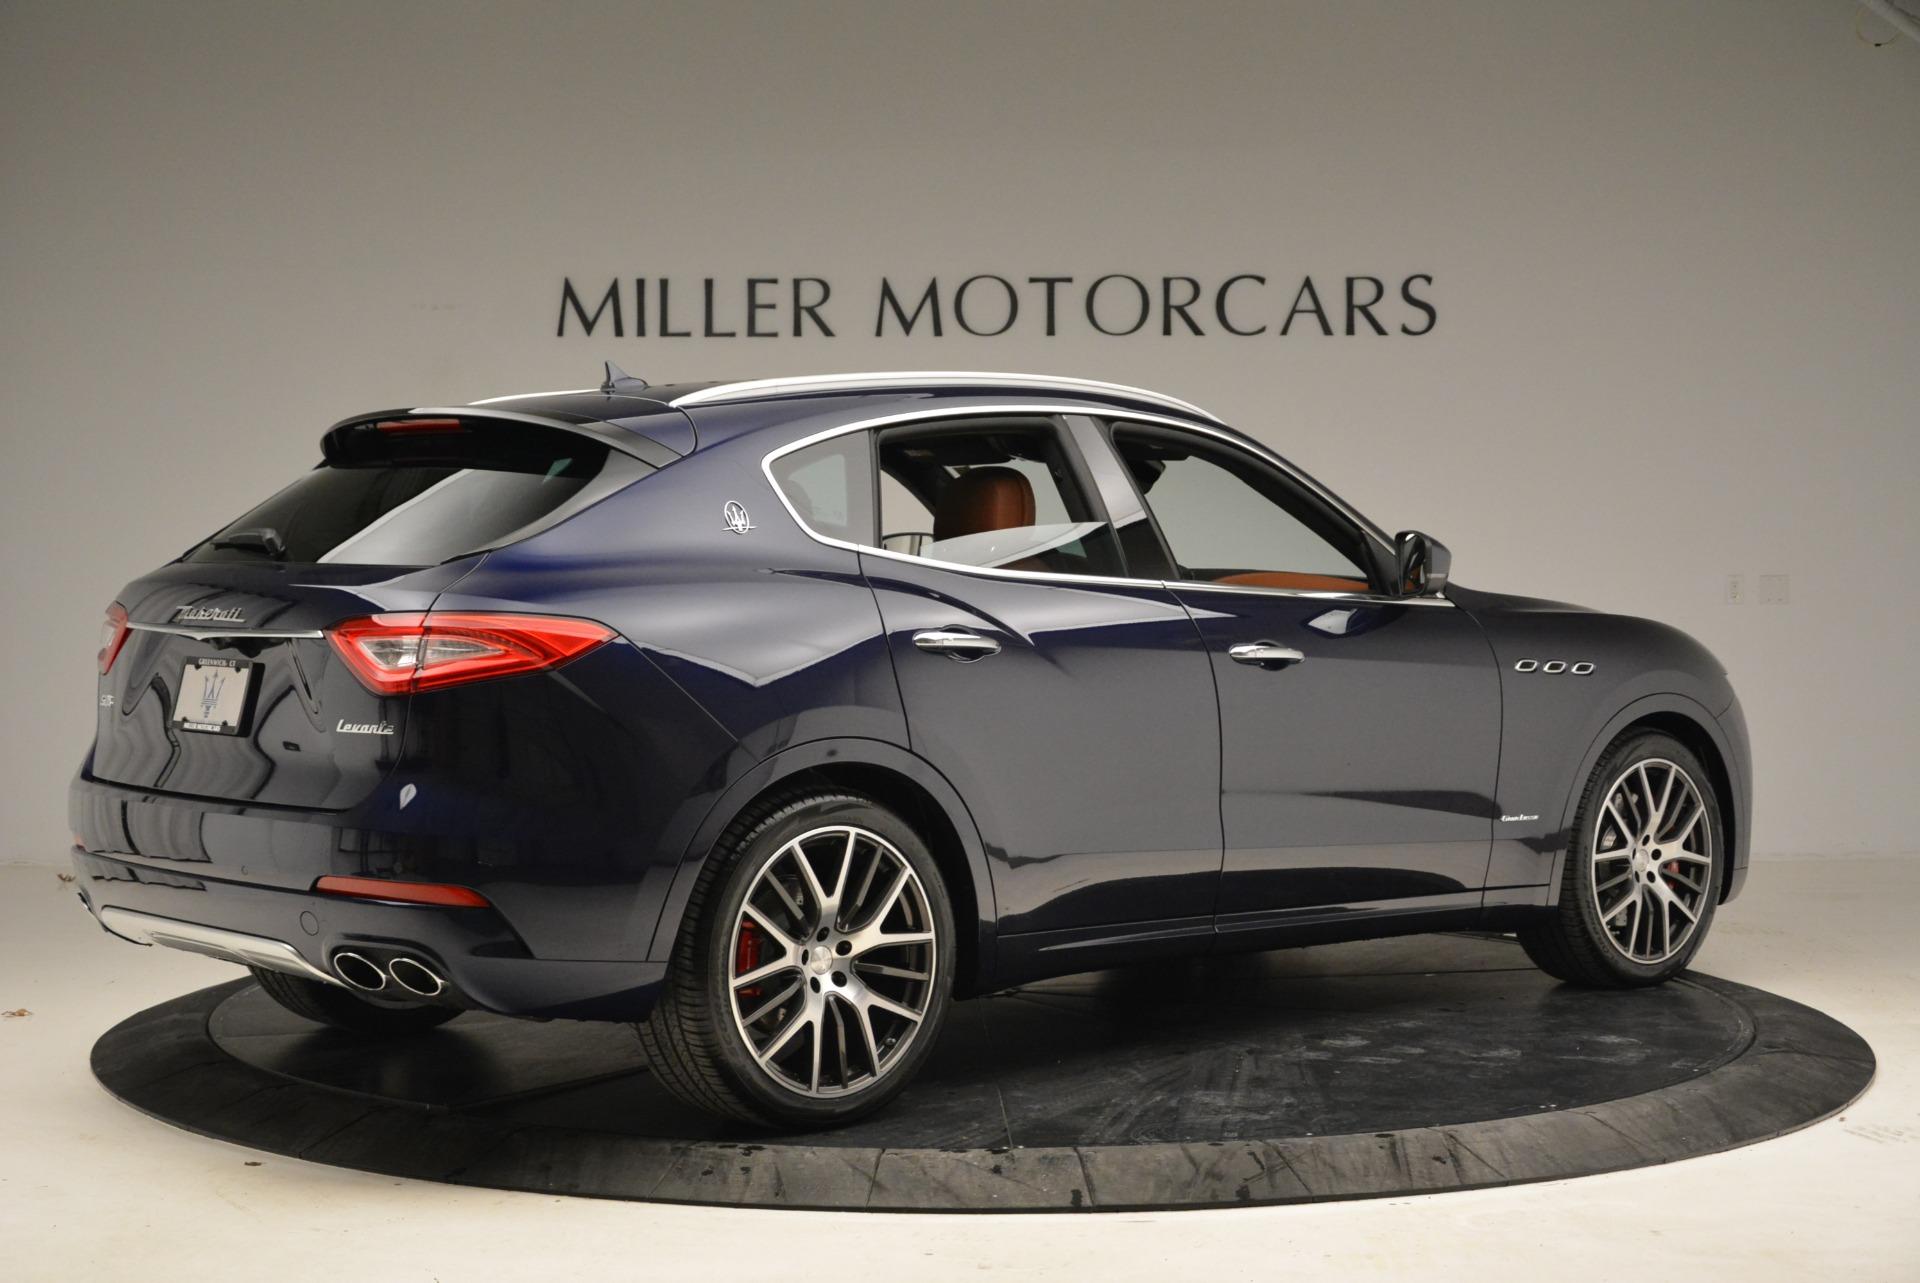 New-2018-Maserati-Levante-S-Q4-GranLusso